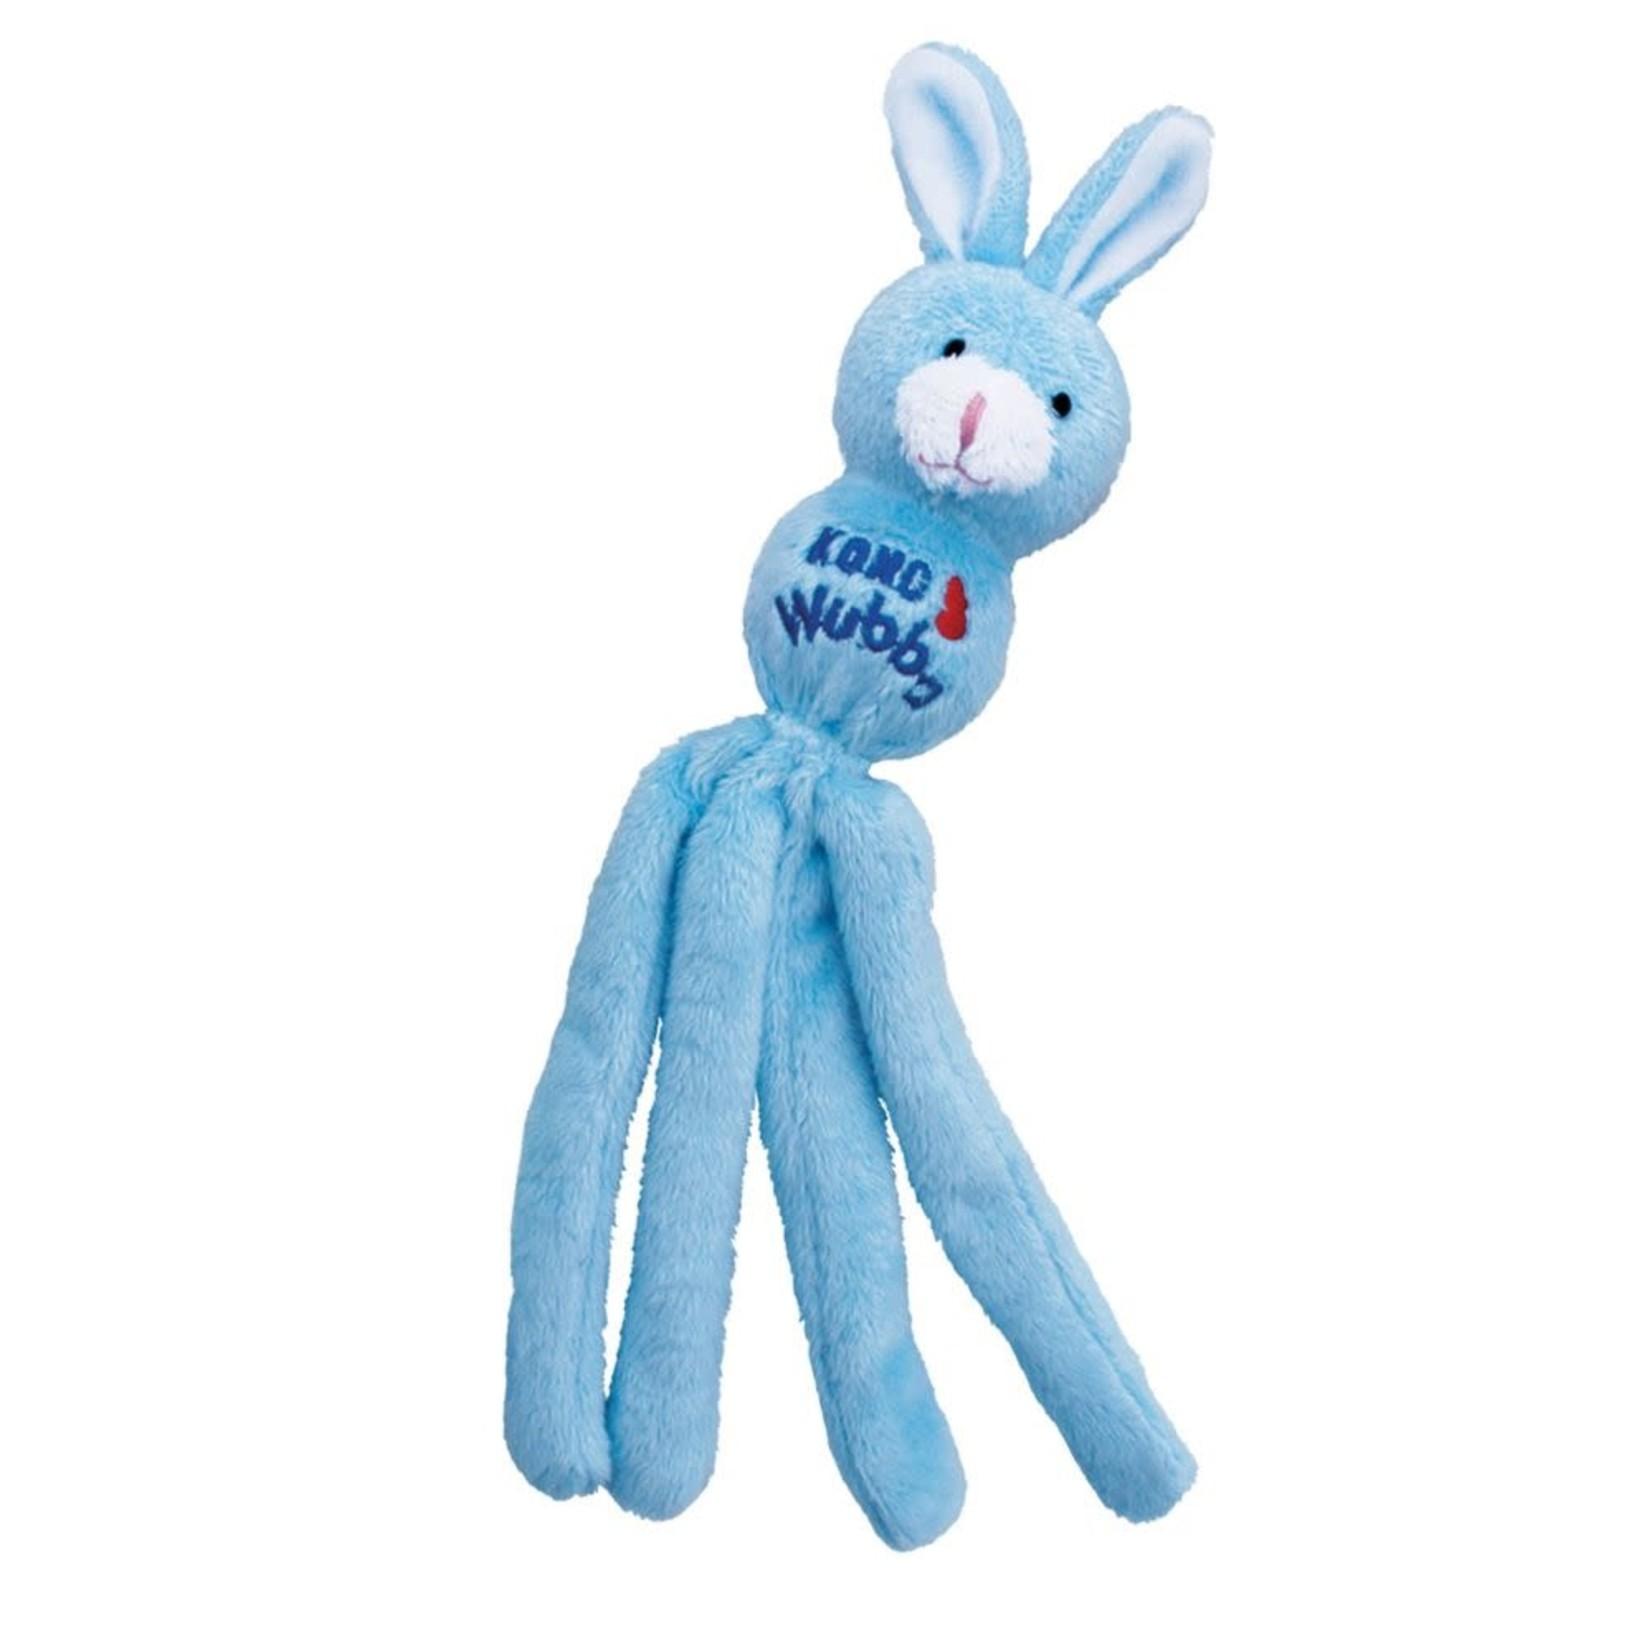 KONG Wubba Bunny Cat Toy